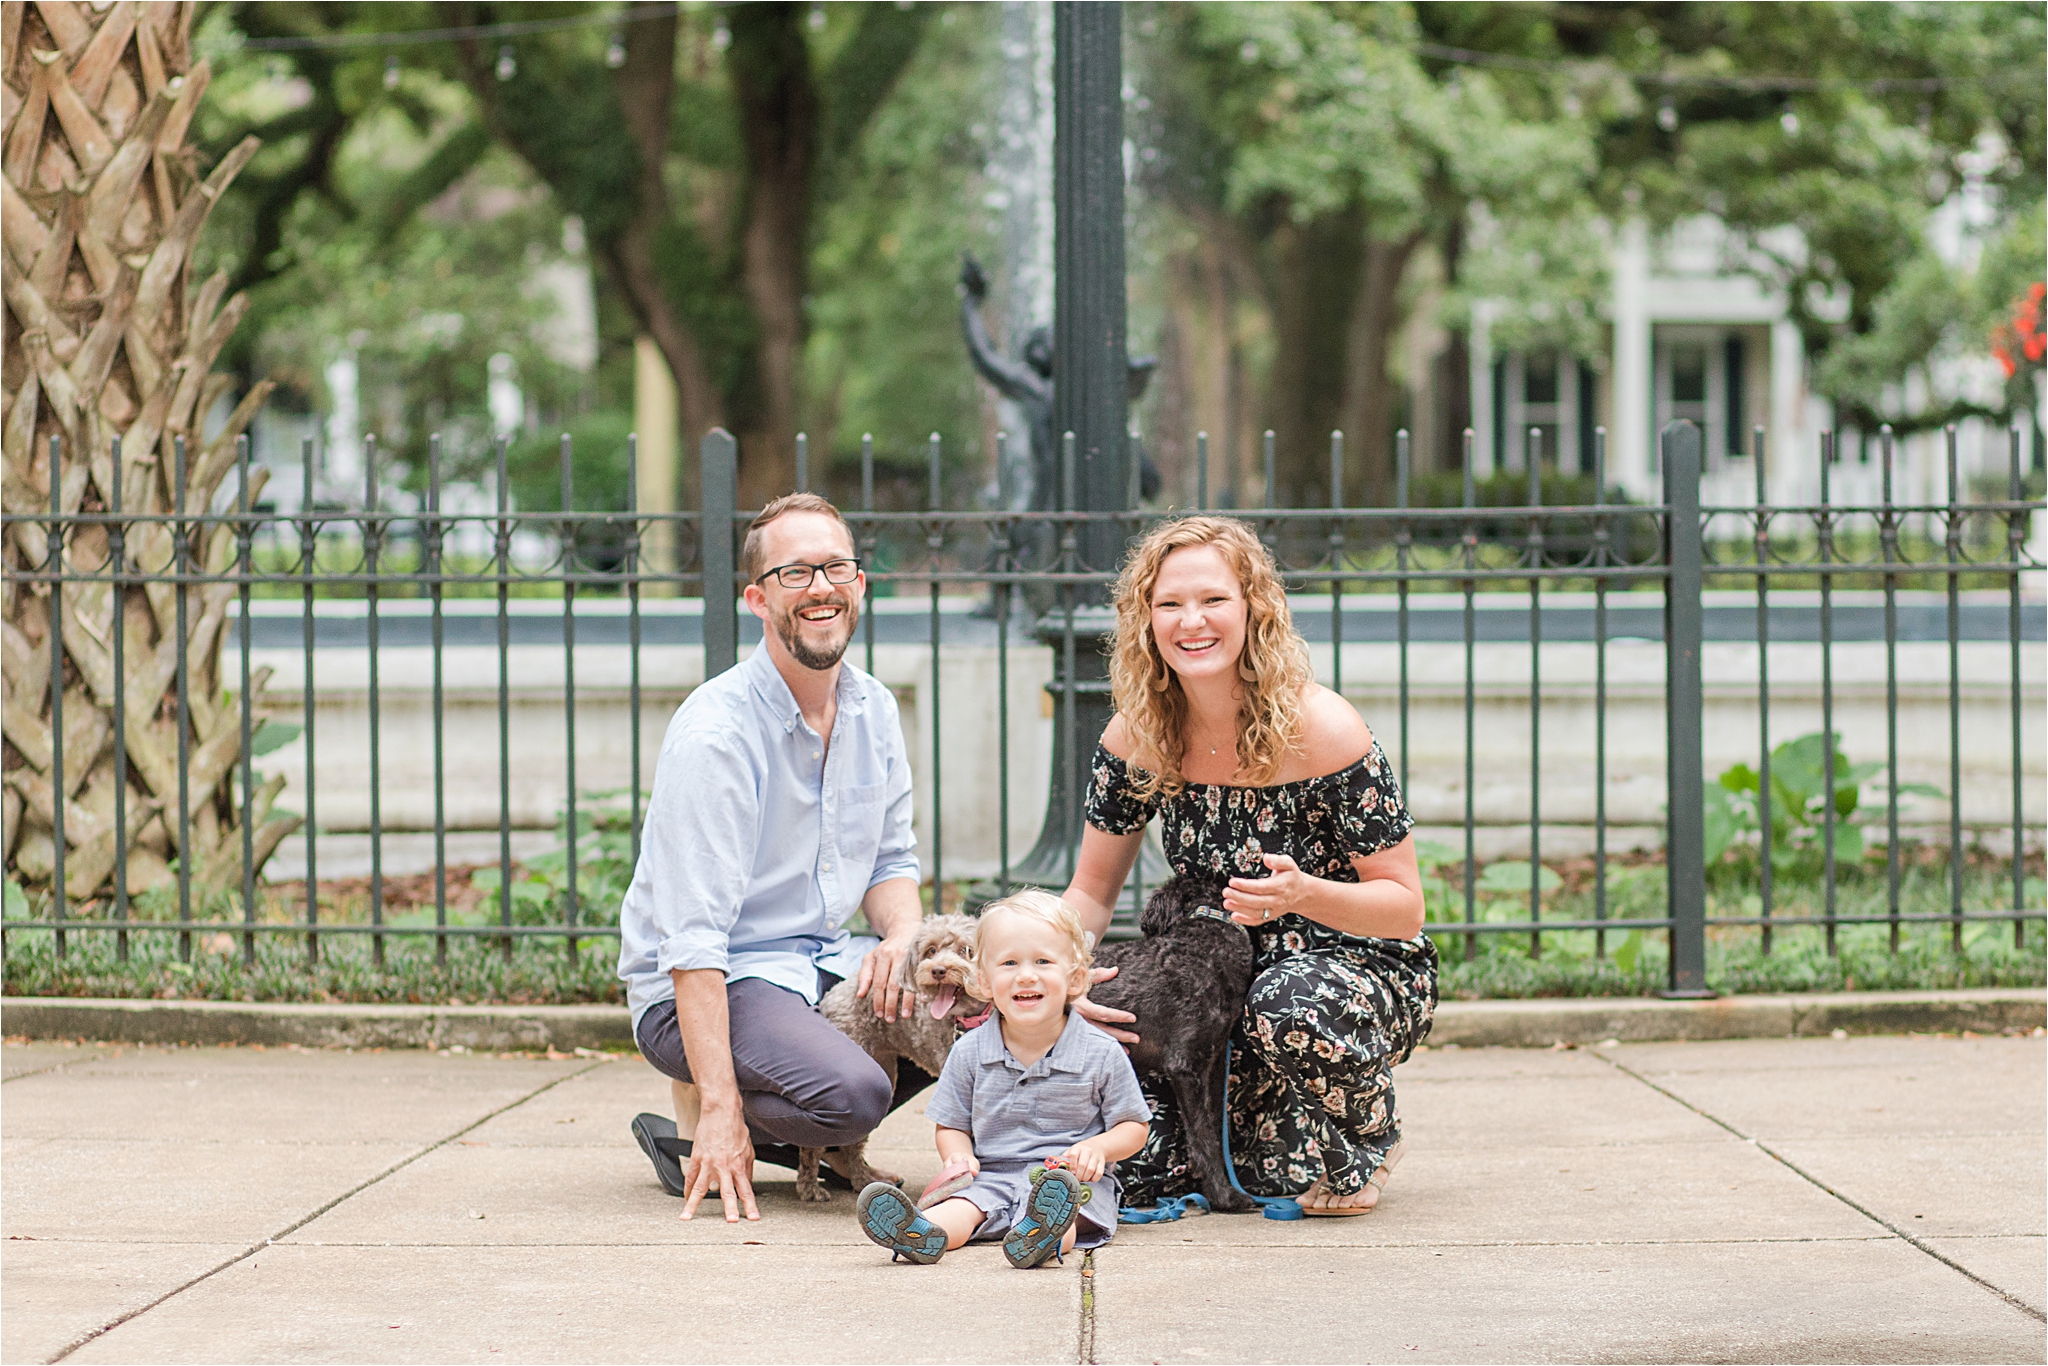 Washington Square Park Family Photography   The Taulbee Family